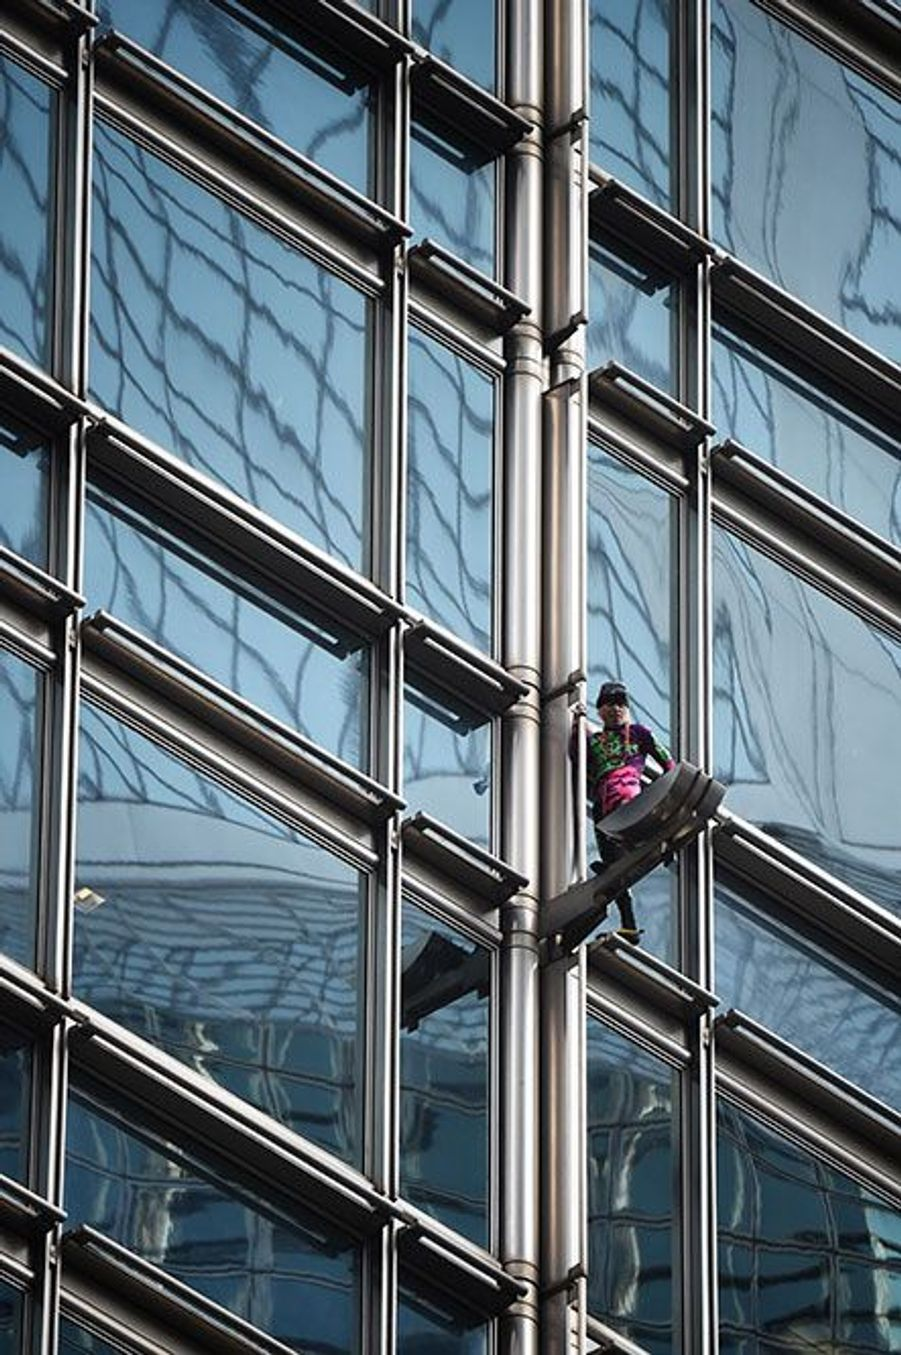 Alain Robert escalade leCheungKongCenter à Hong Kong, vendredi, pour y installer une banderole.